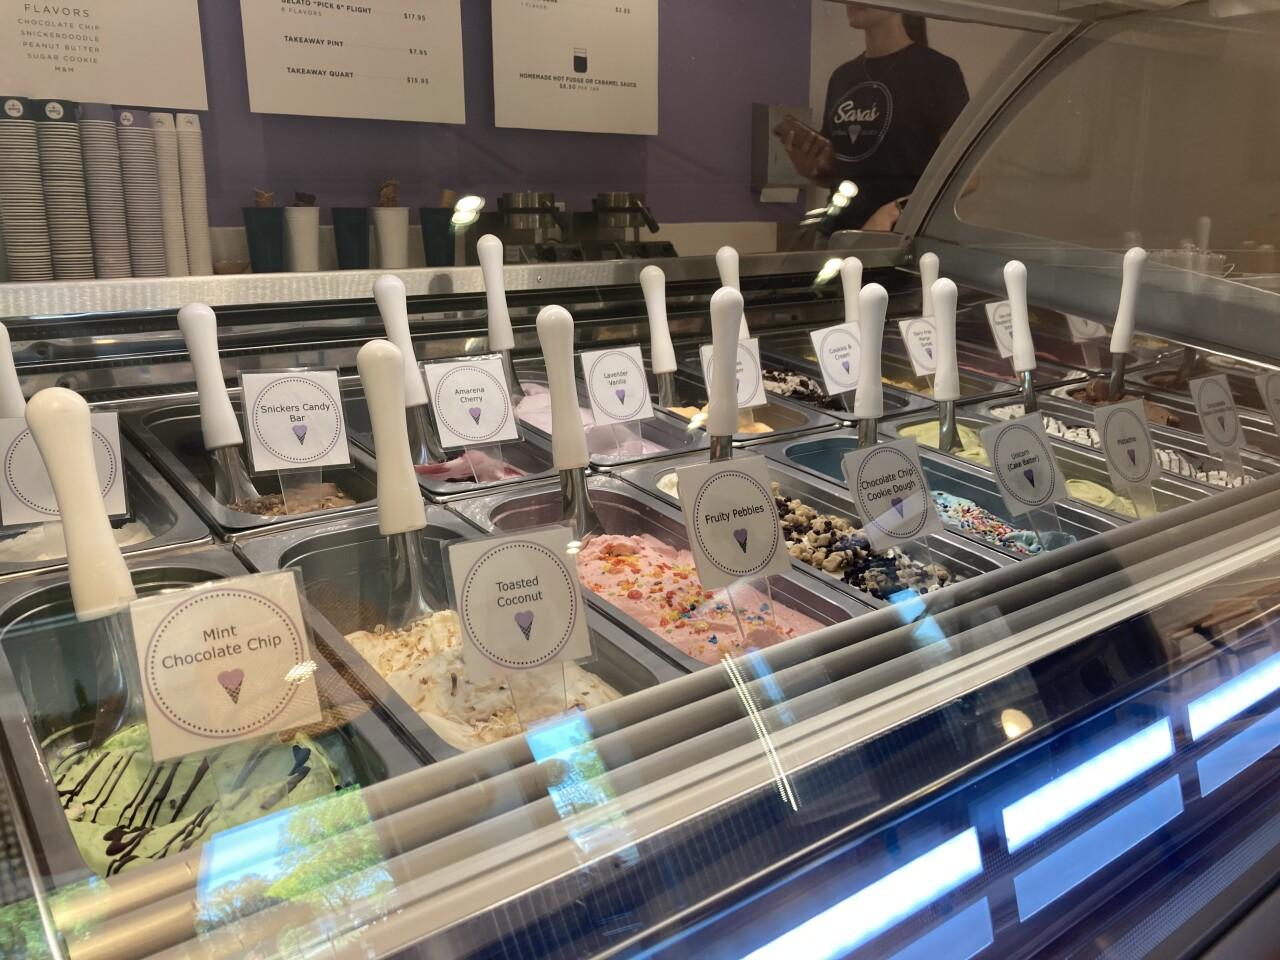 Gelato flavors at Sara's Artisan Gelato